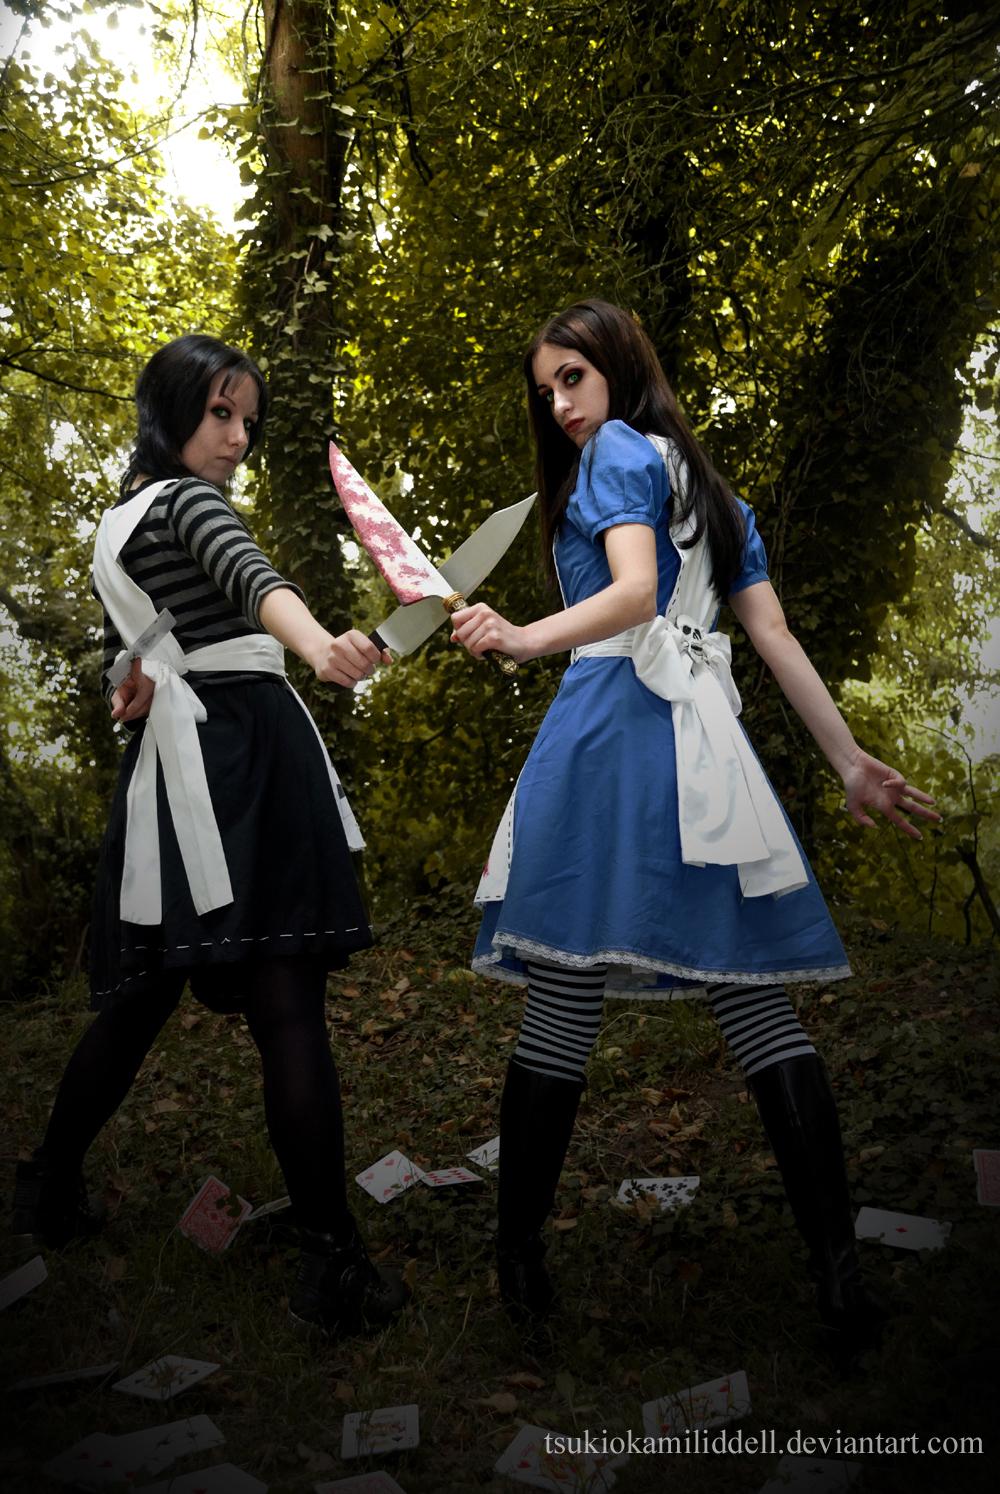 Reality VS Wonderland by TsukiOkamiLiddell